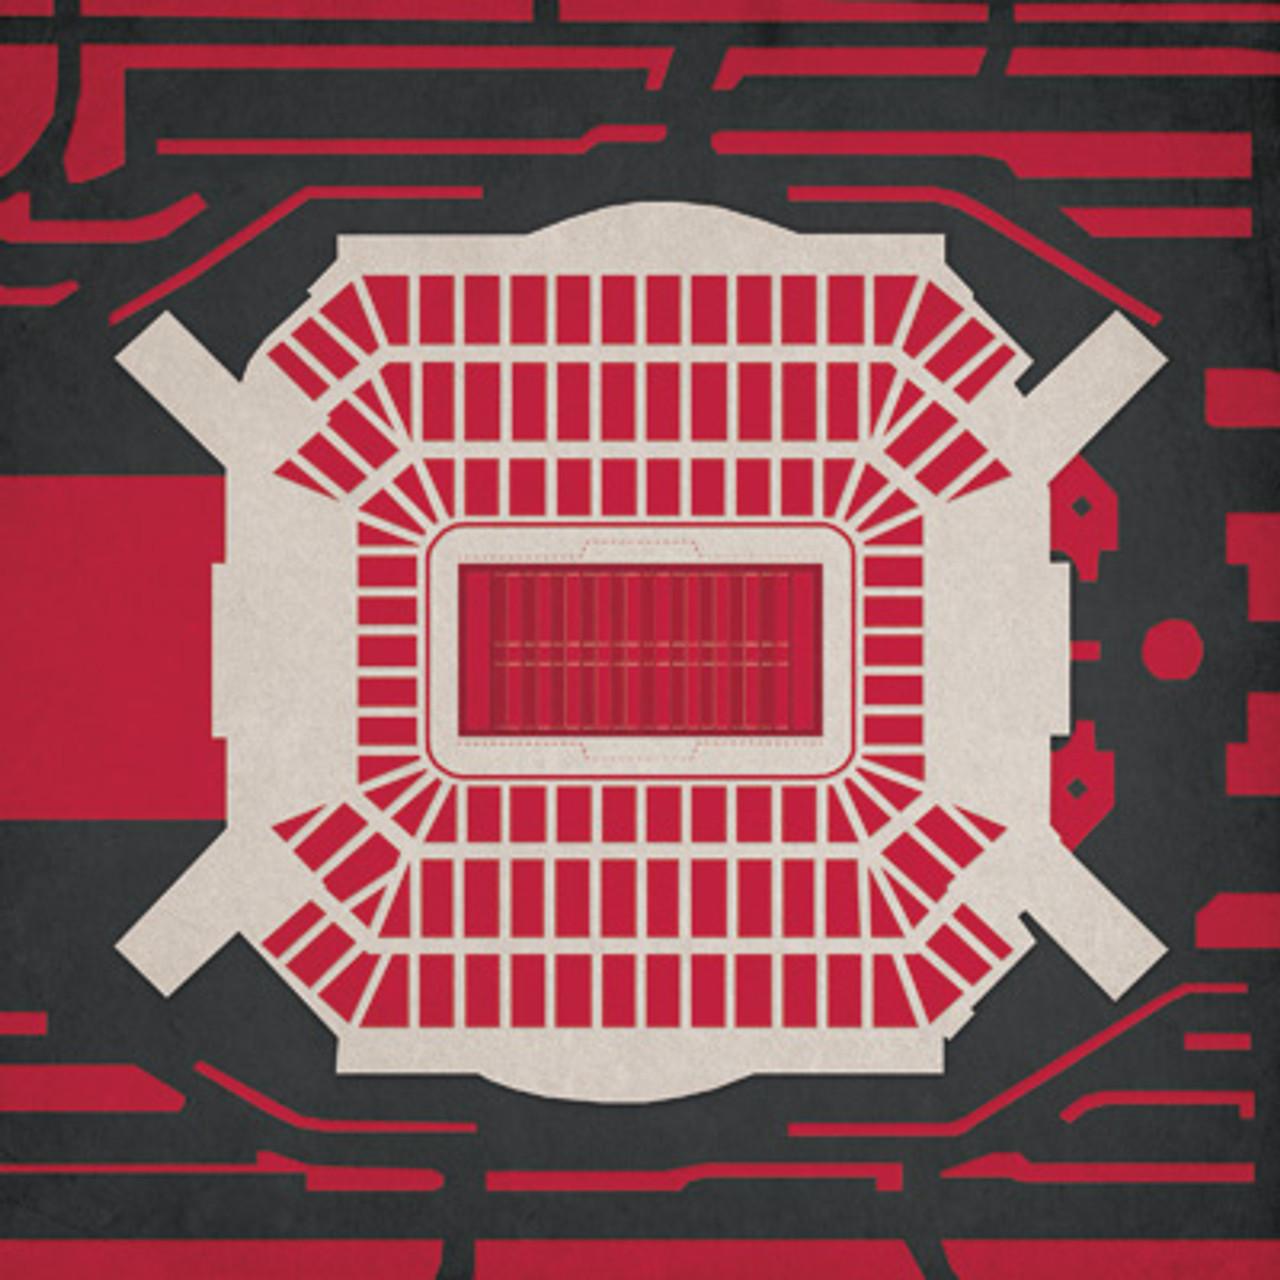 Raymond James Stadium - Tampa Bay Buccaneers City Print